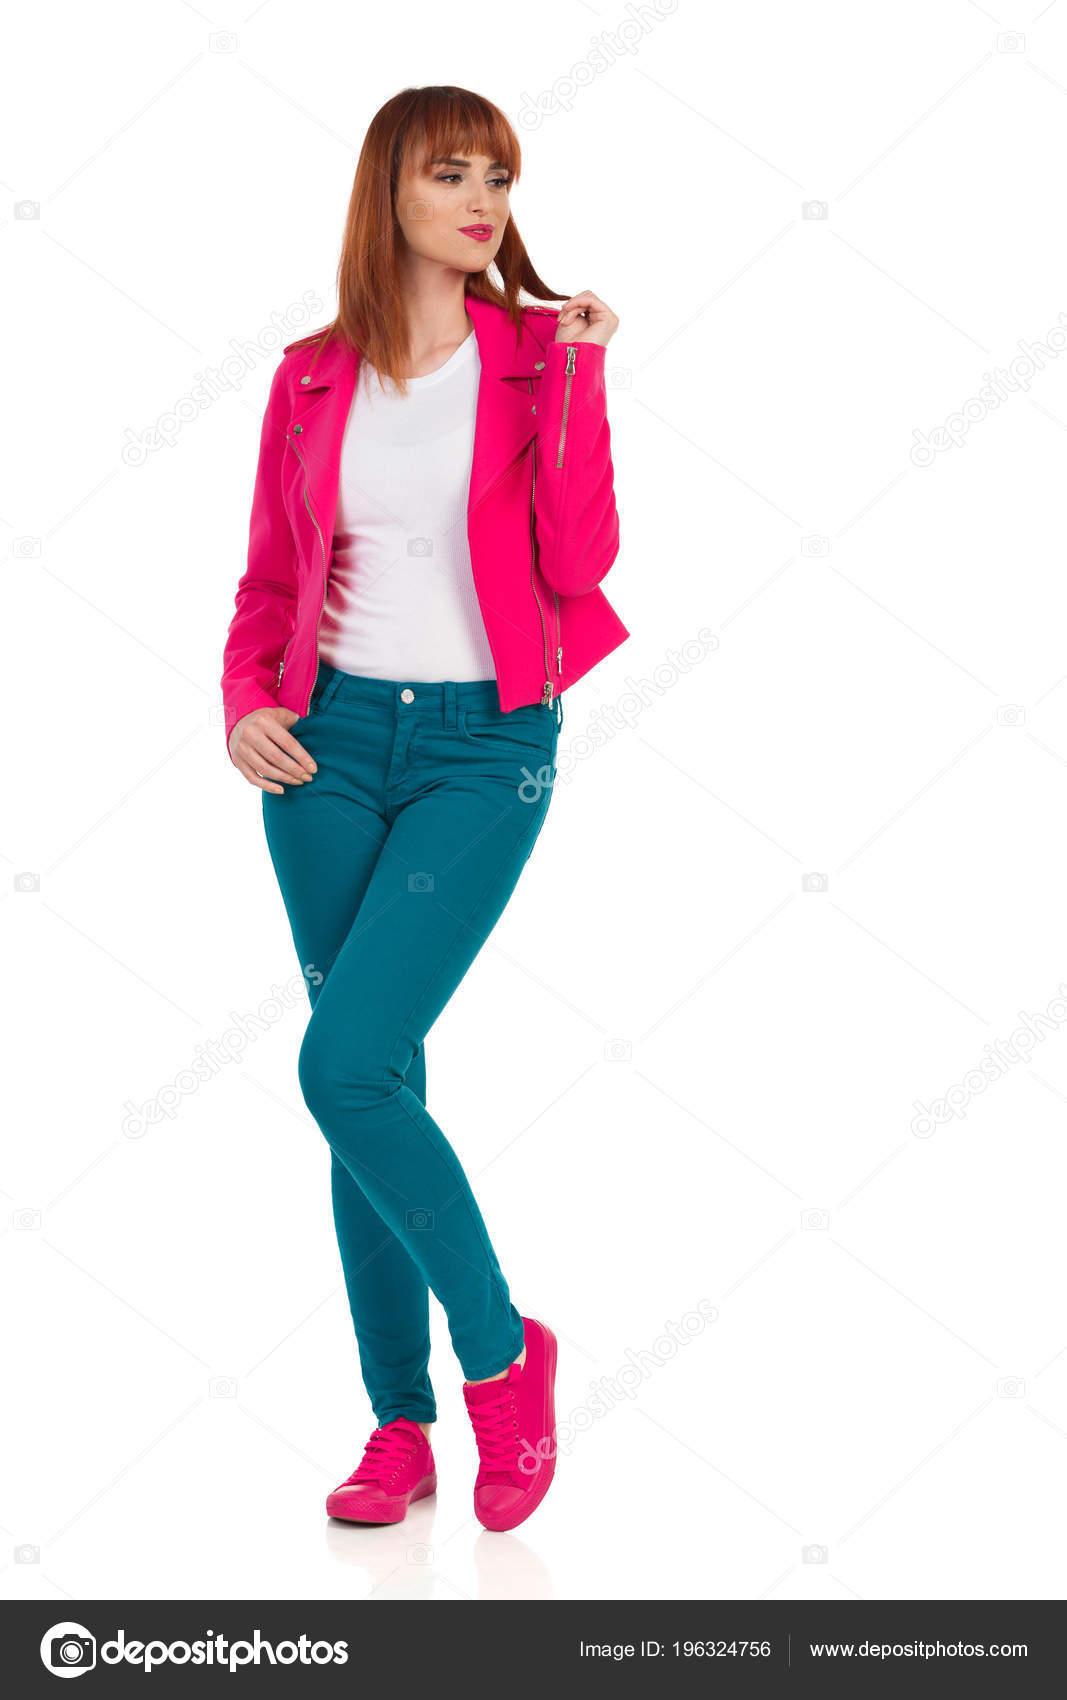 7bb5f52c943a Νεαρή Γυναίκα Ροζ Σακάκι Ξεκούμπωτο Πράσινο Τζιν Και Sneakers Είναι —  Φωτογραφία Αρχείου